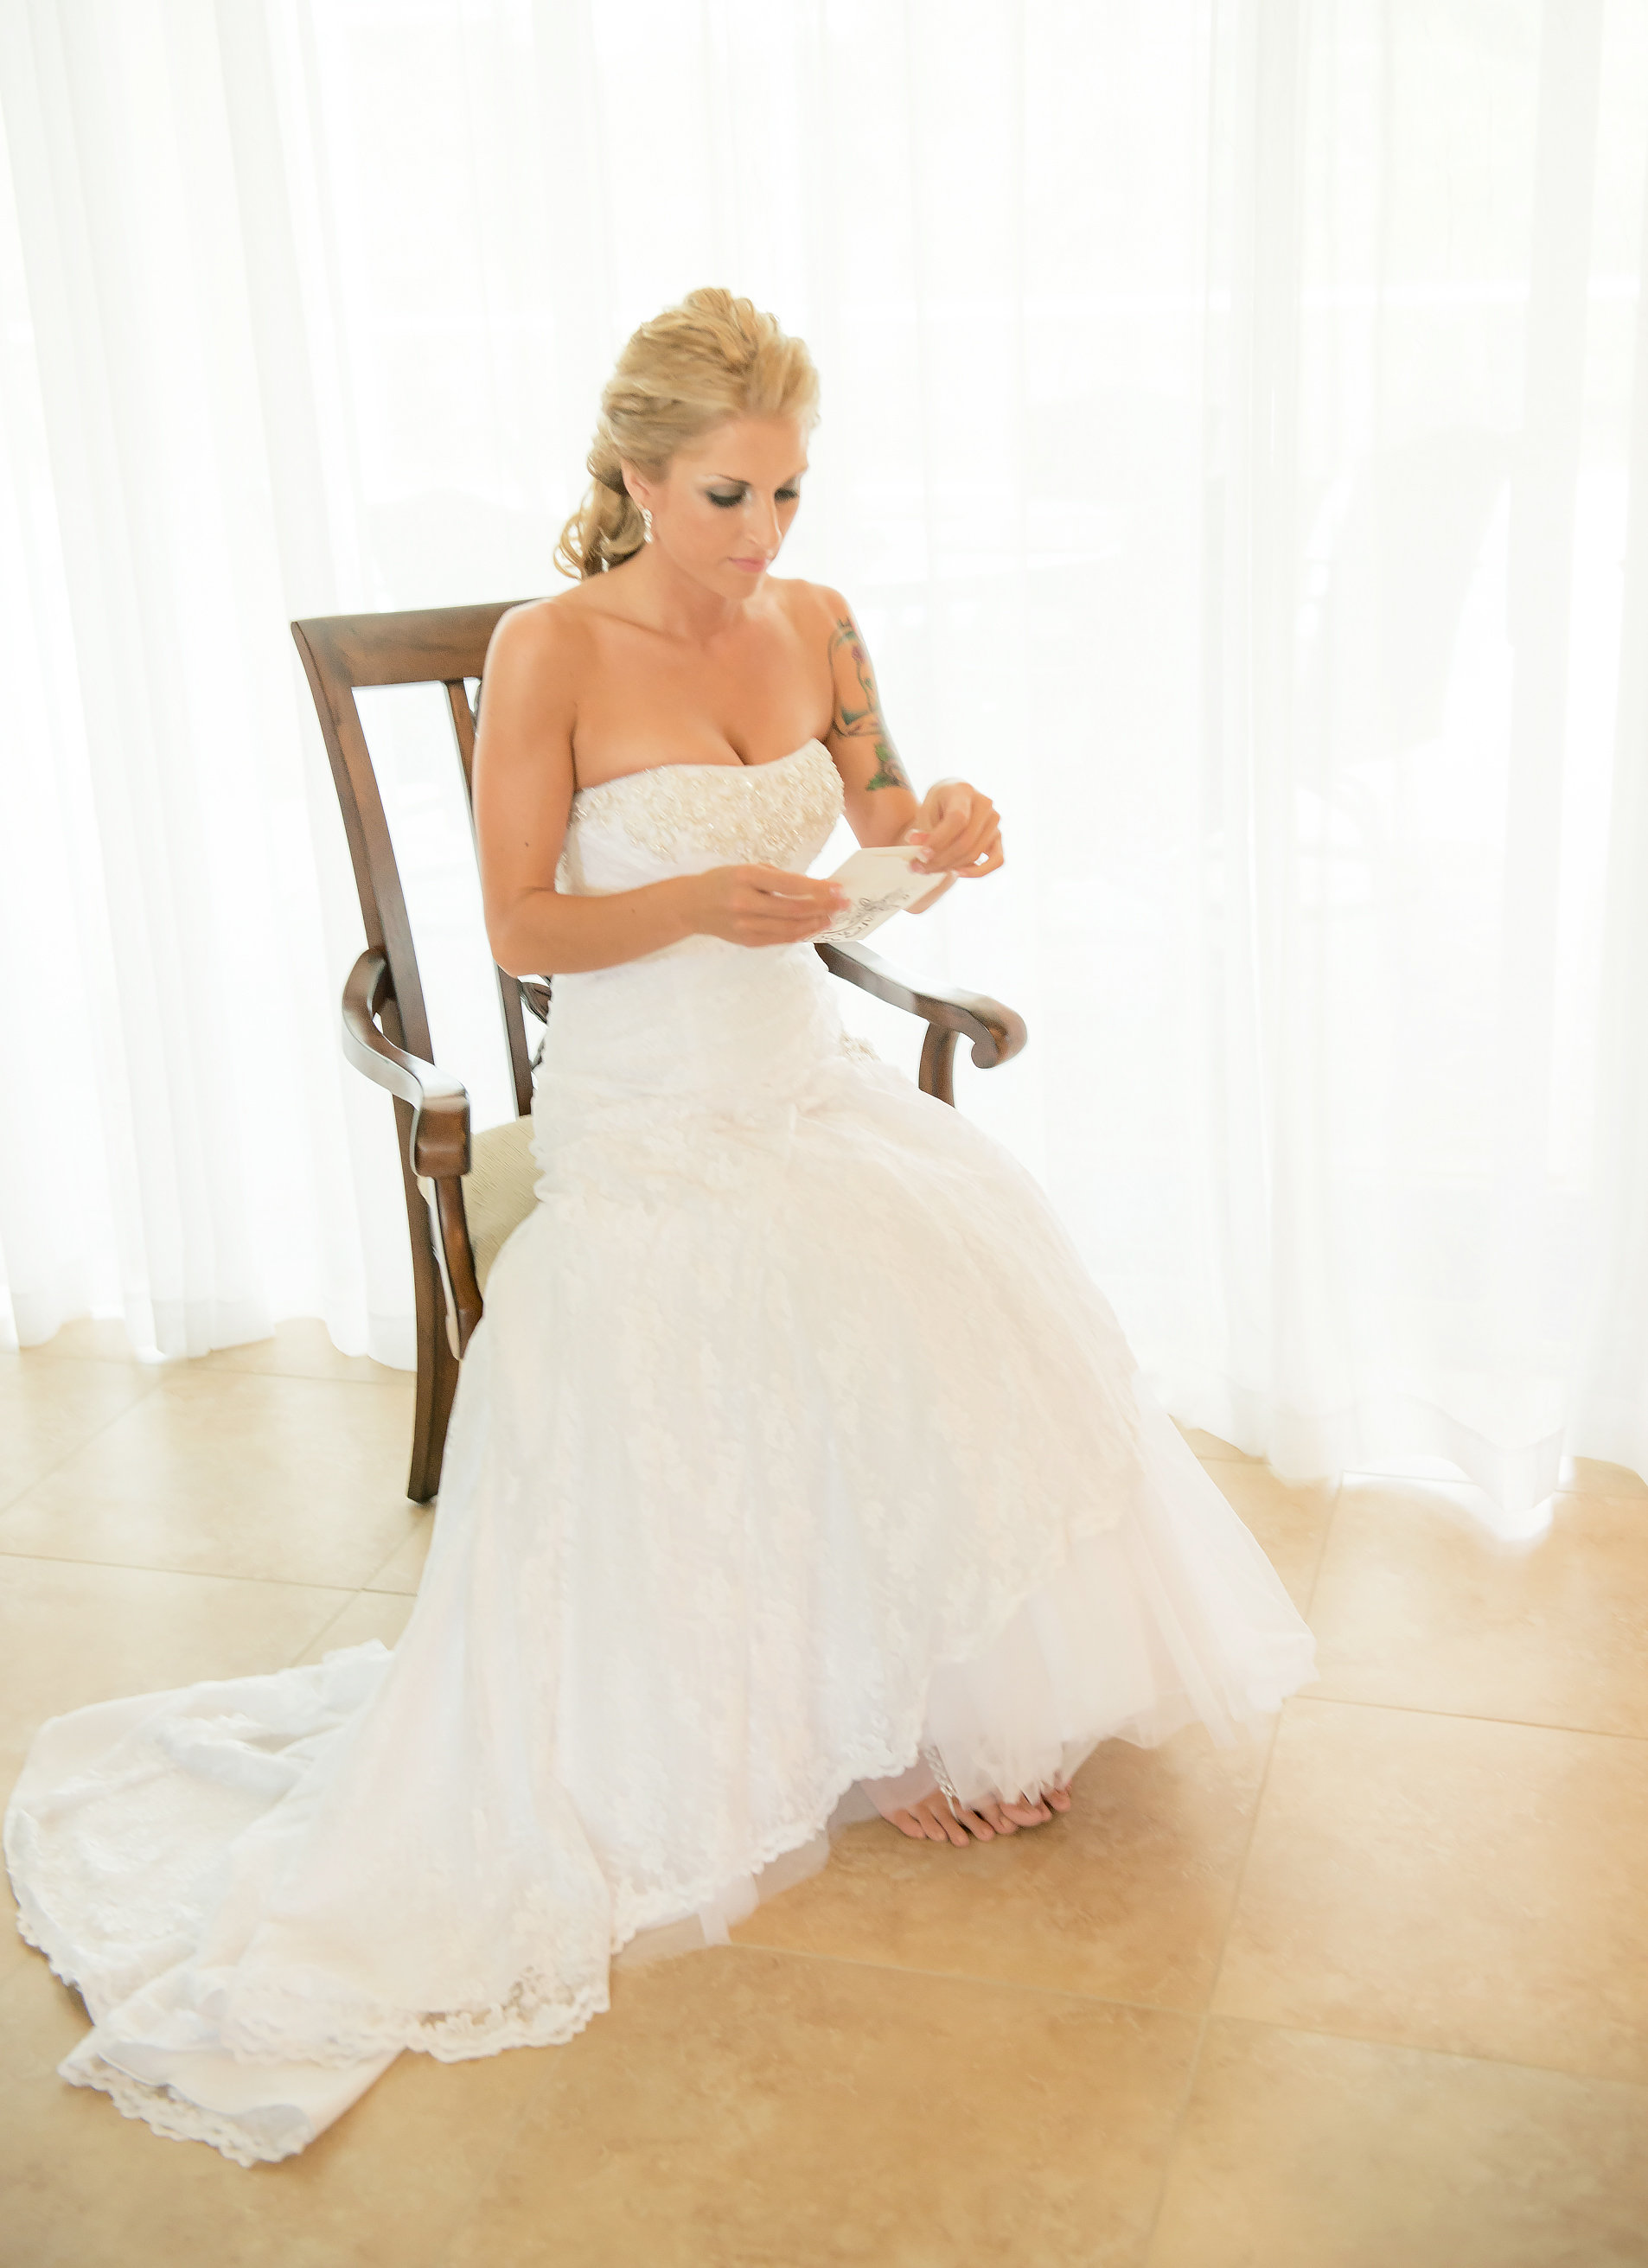 Heather Chuck s Wedding Day-Heather Chuck s Wedding Day-0066.jpg